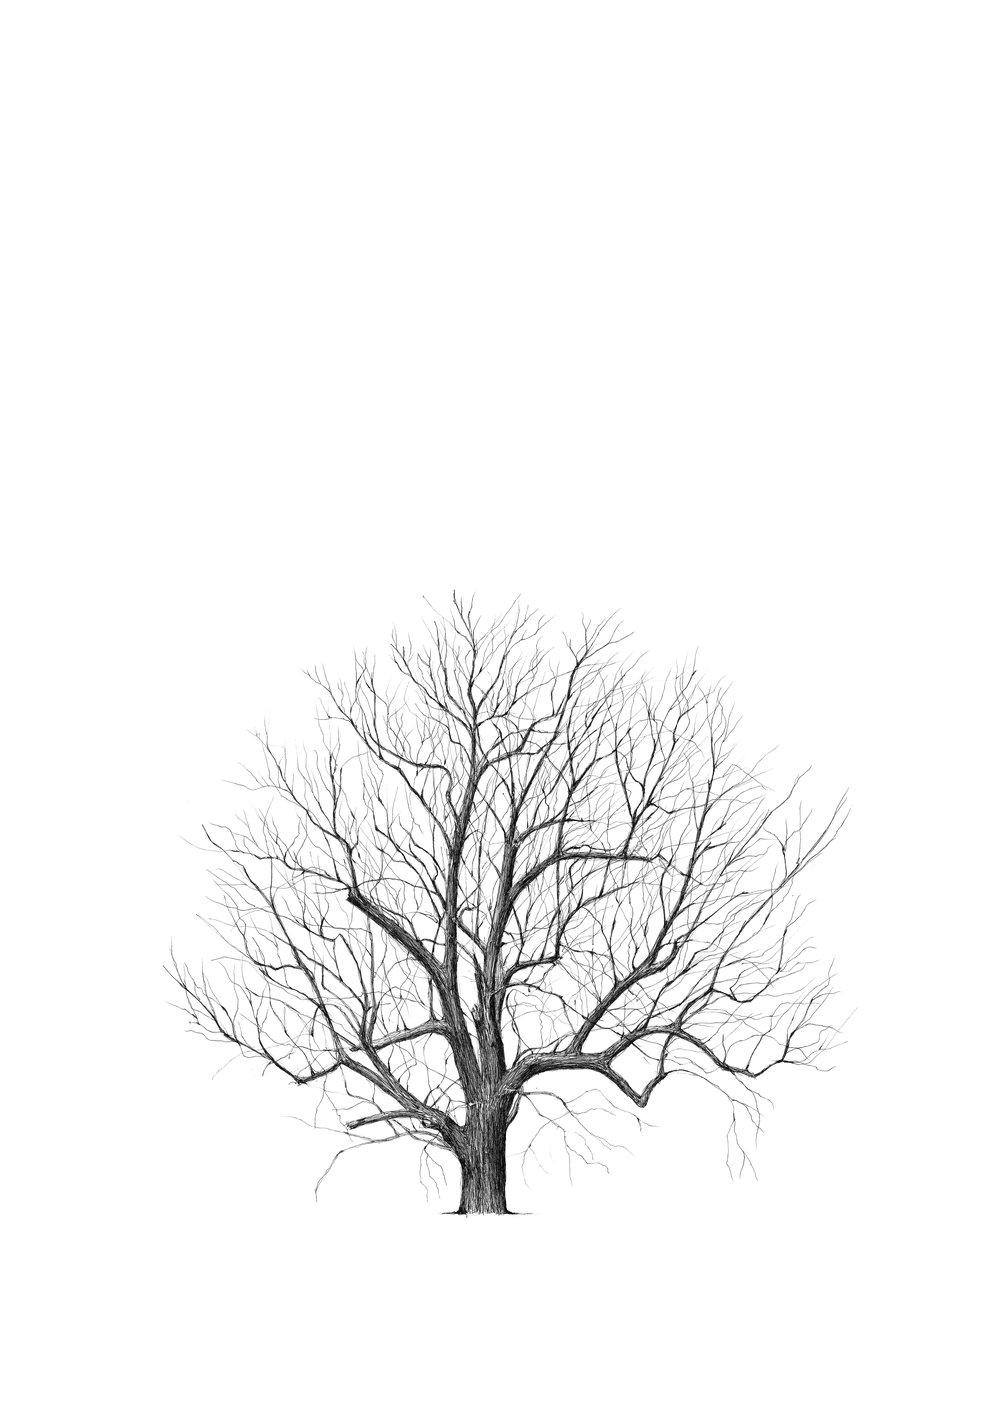 Marble Hill Black Walnut- Luke Adam Hawker.jpg